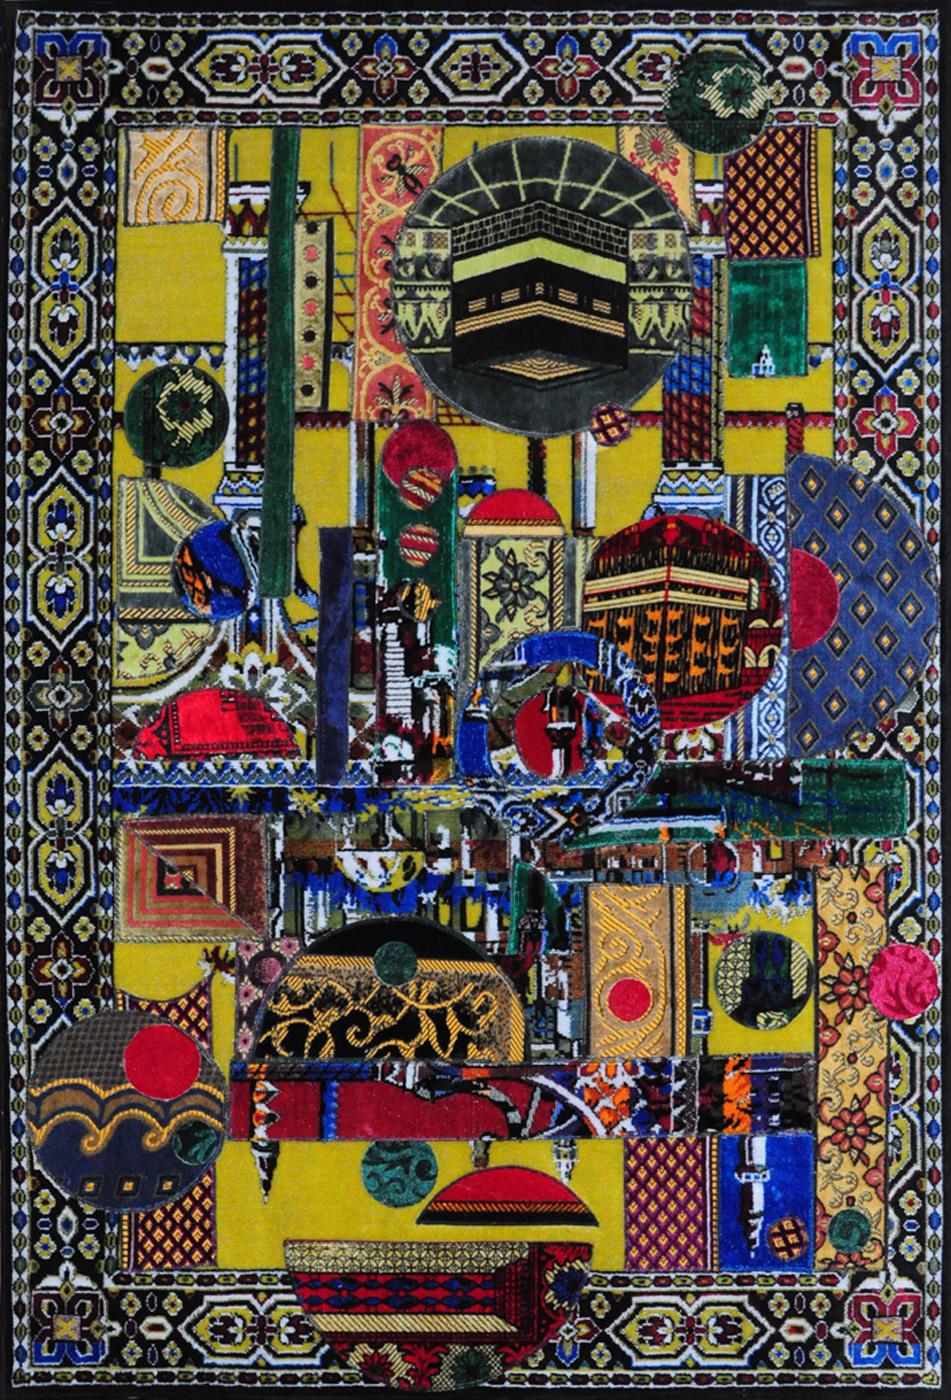 Mounir Fatmi   Father's Carpet #8 , 2010 unique hand-made prayer rug collage 55.25 x 37.5 inches 140.3 x 95.3 cm